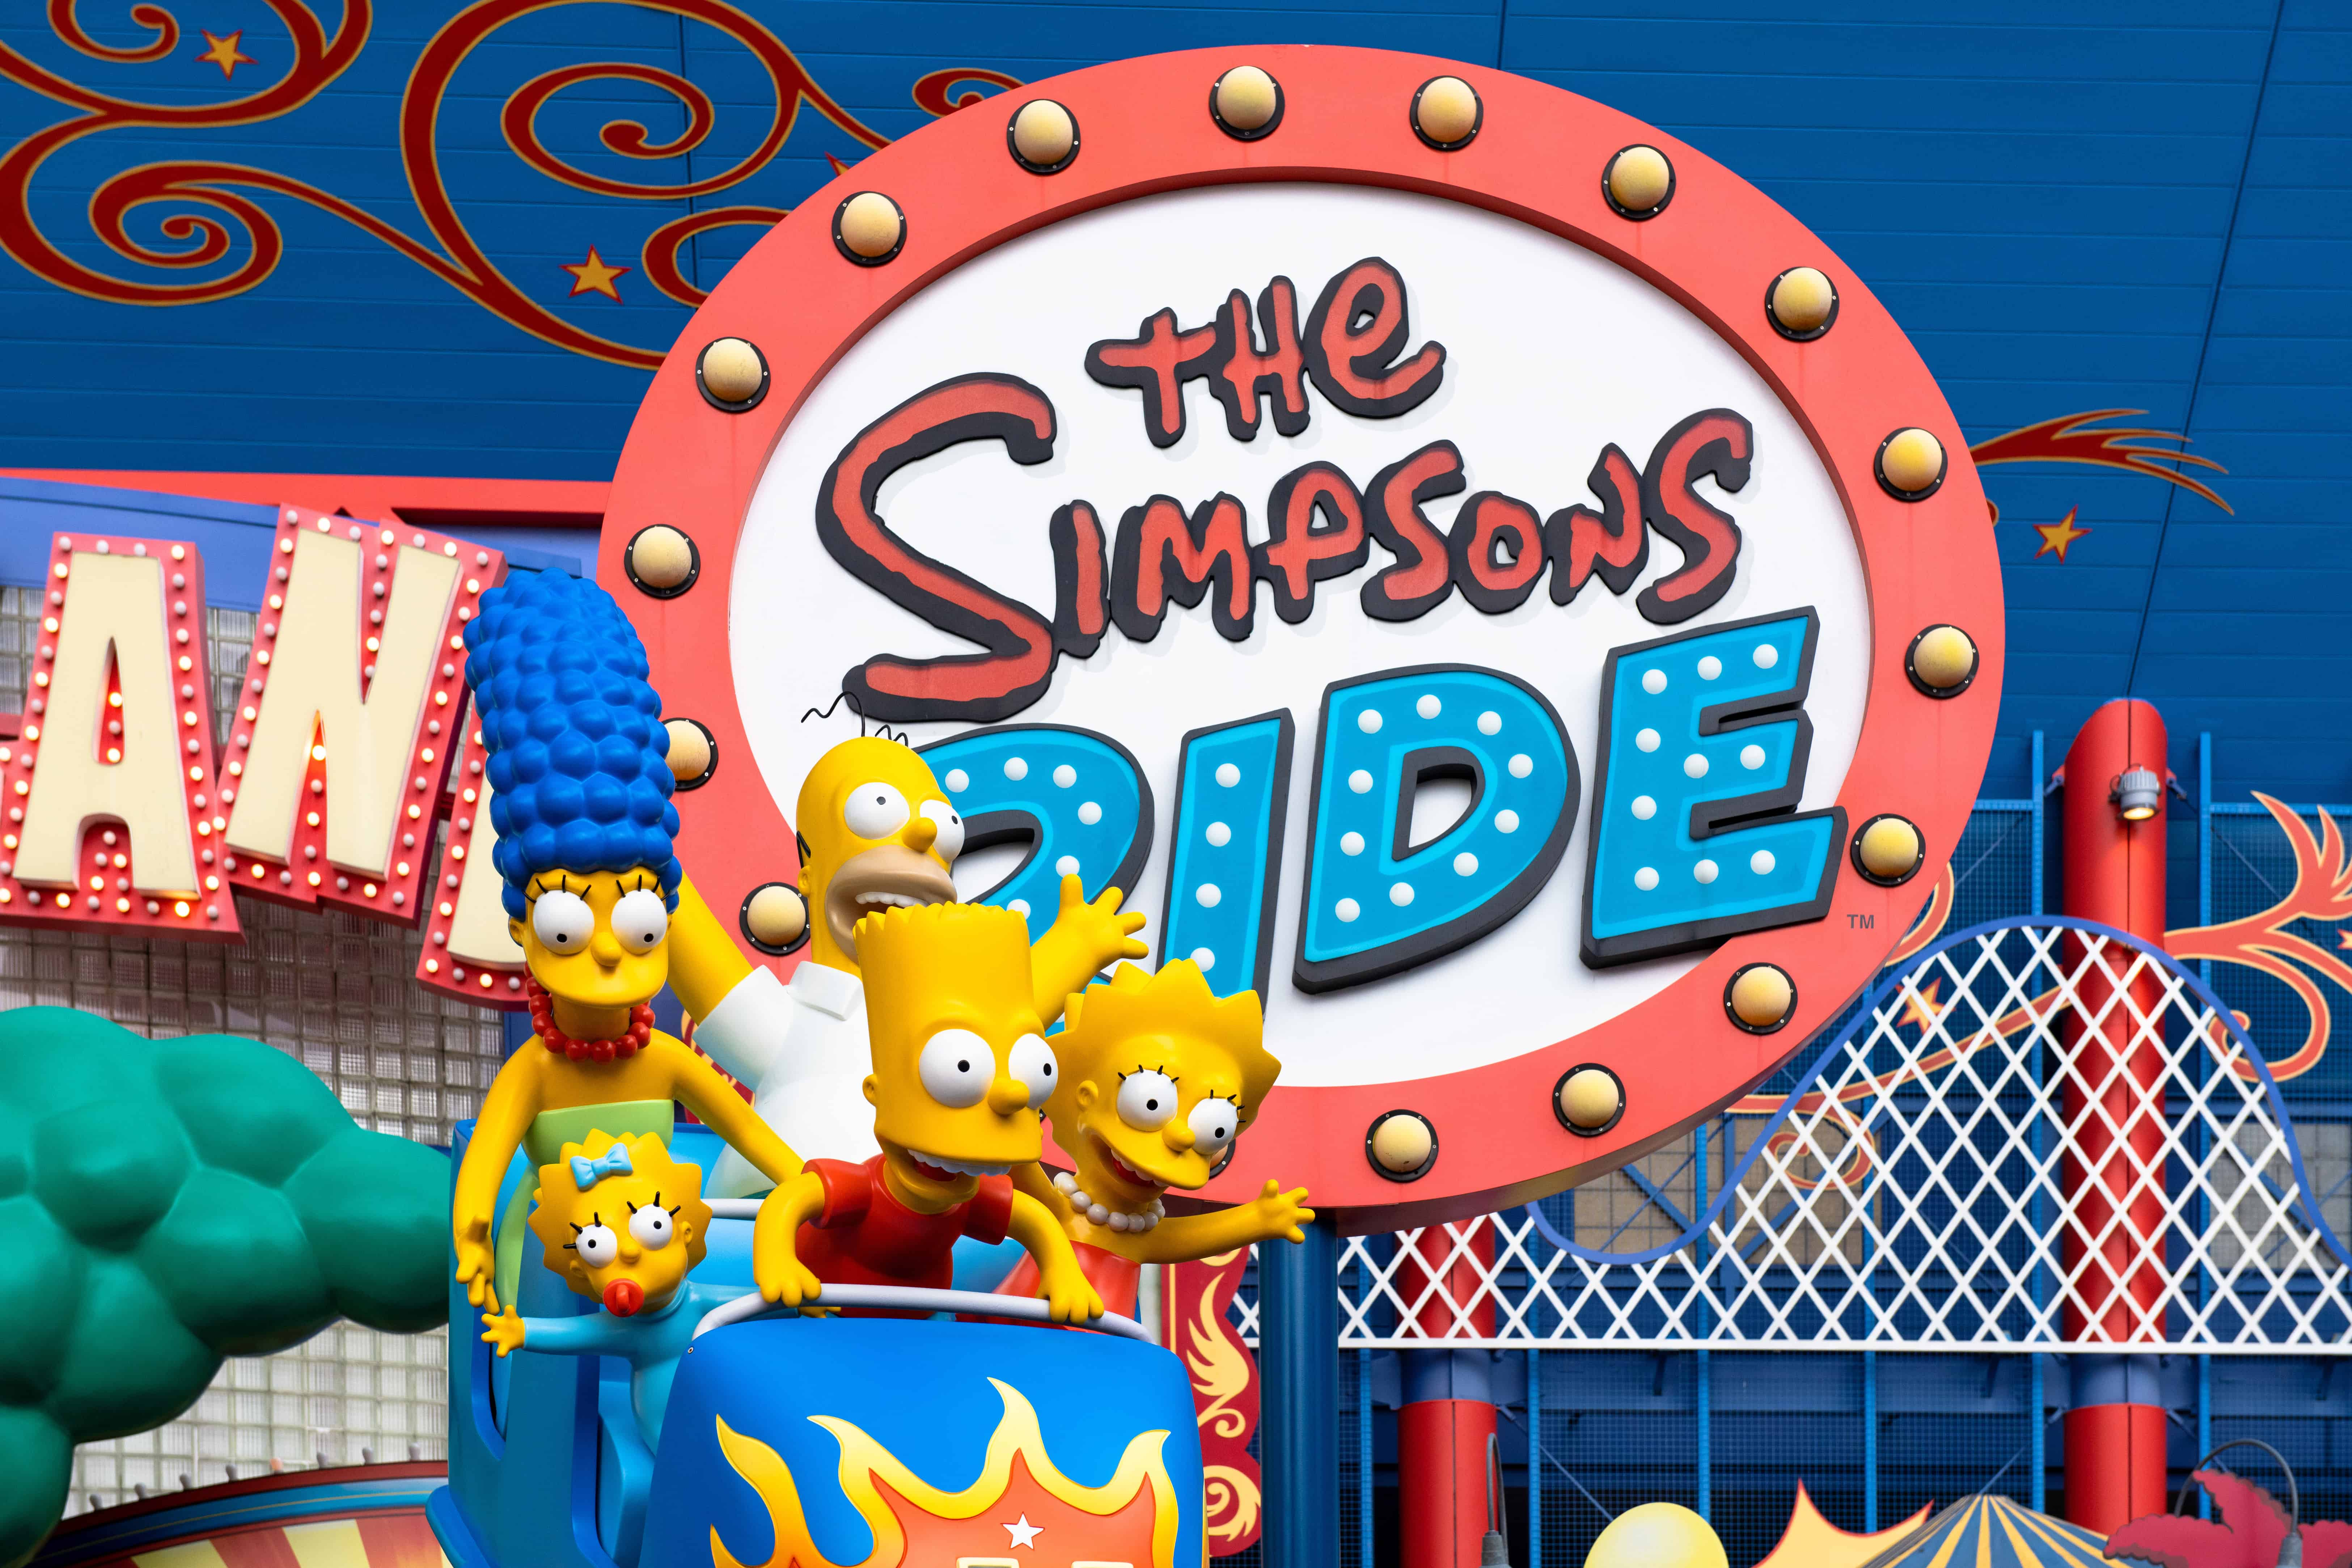 simpsons, entertainment facts